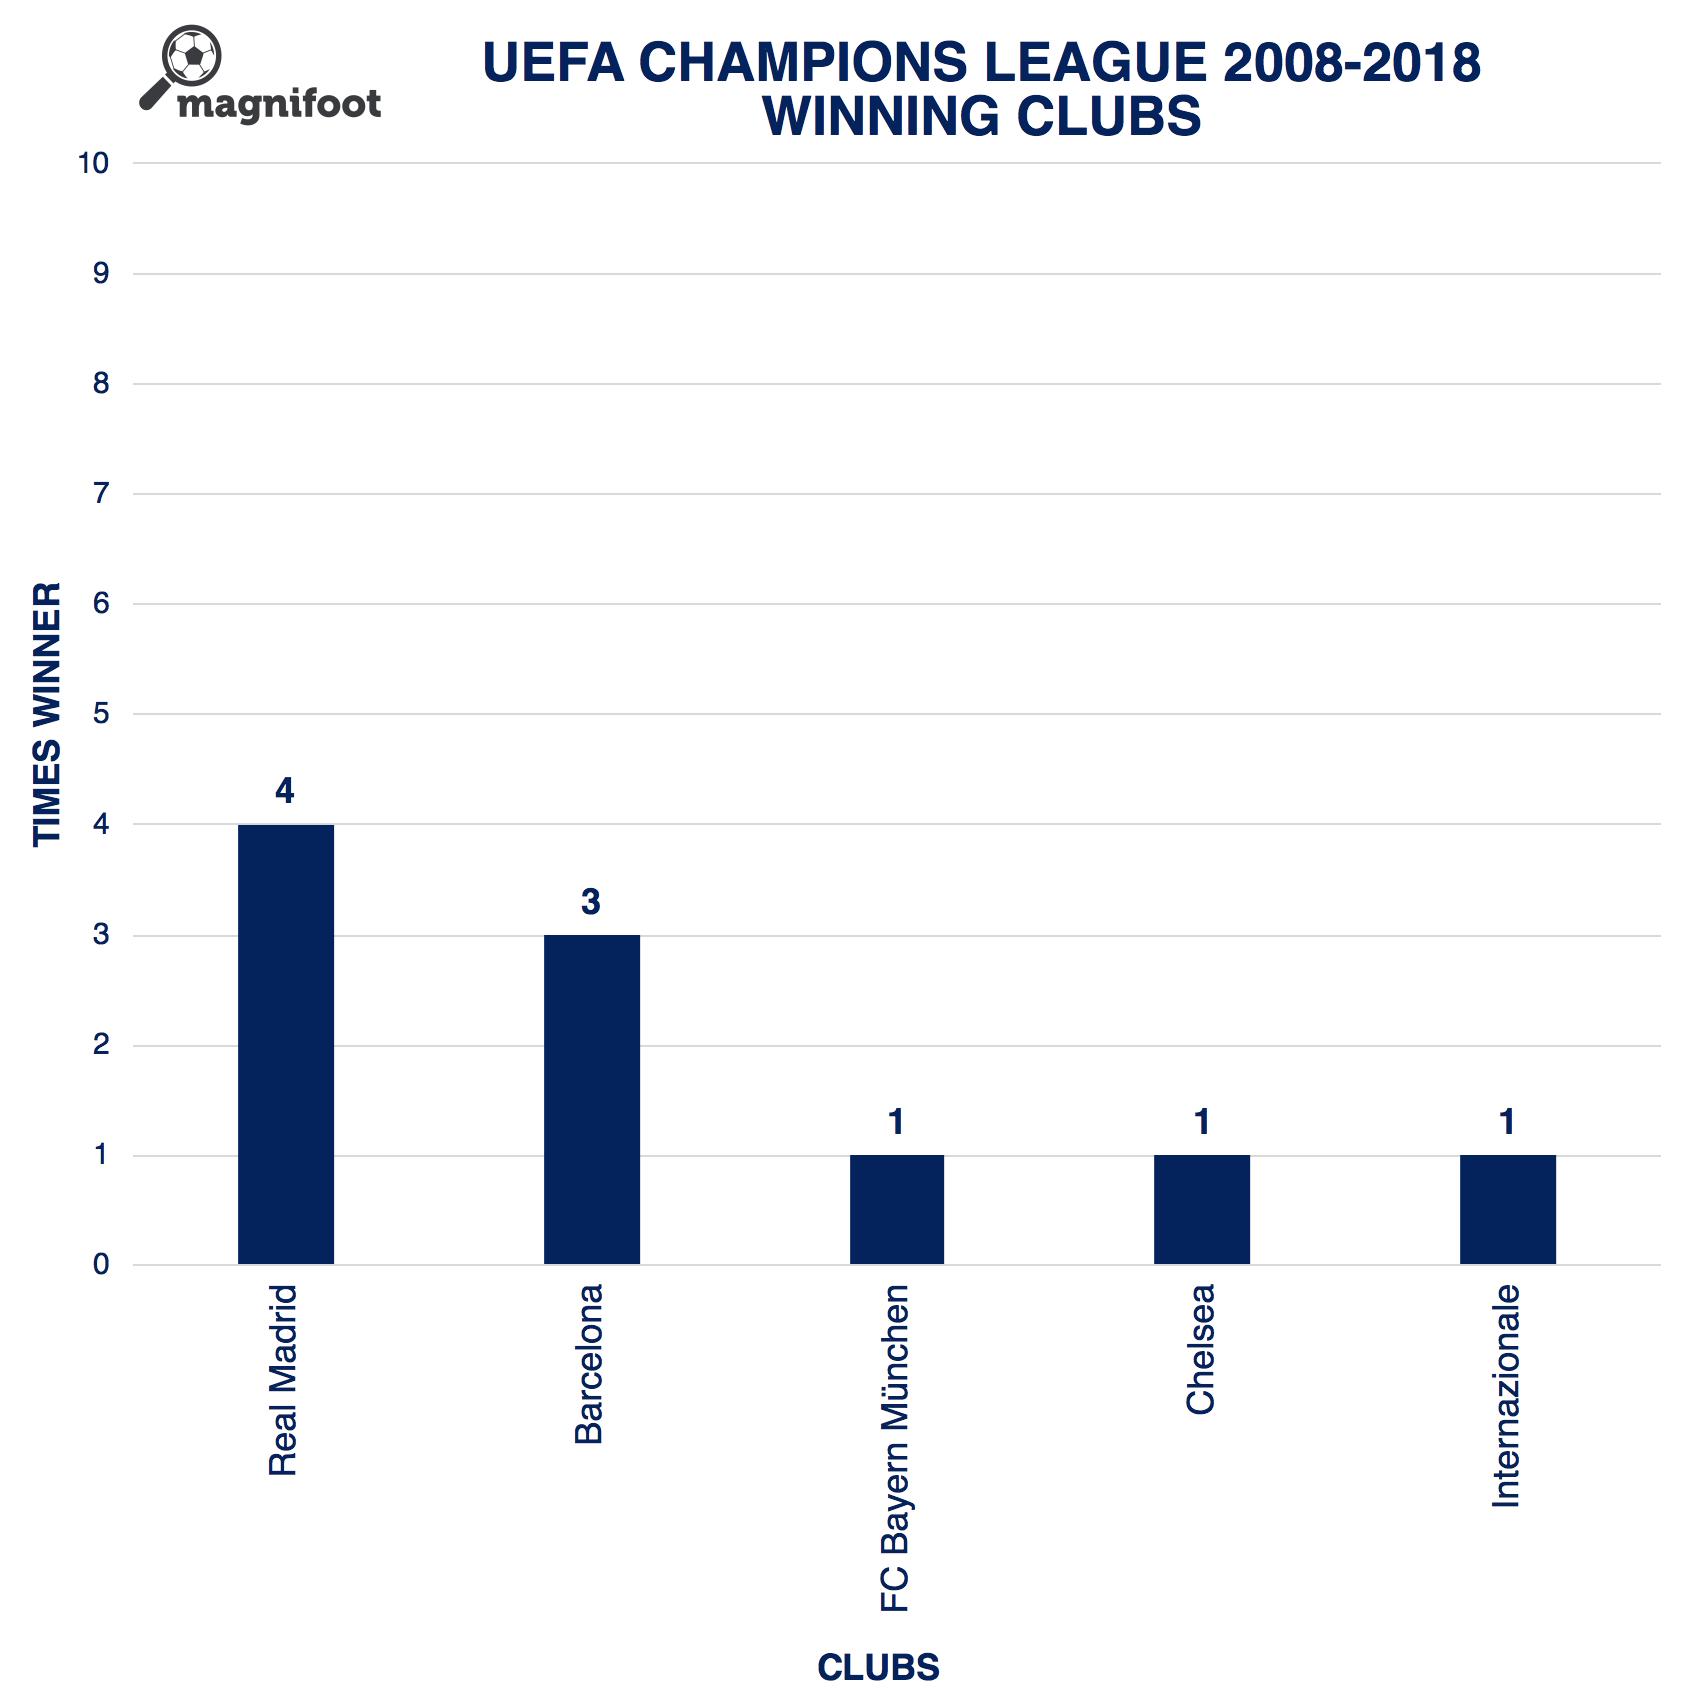 2008-2018 UCL: WINNING CLUBS #magnifoot #uefa #uefachampionsleague